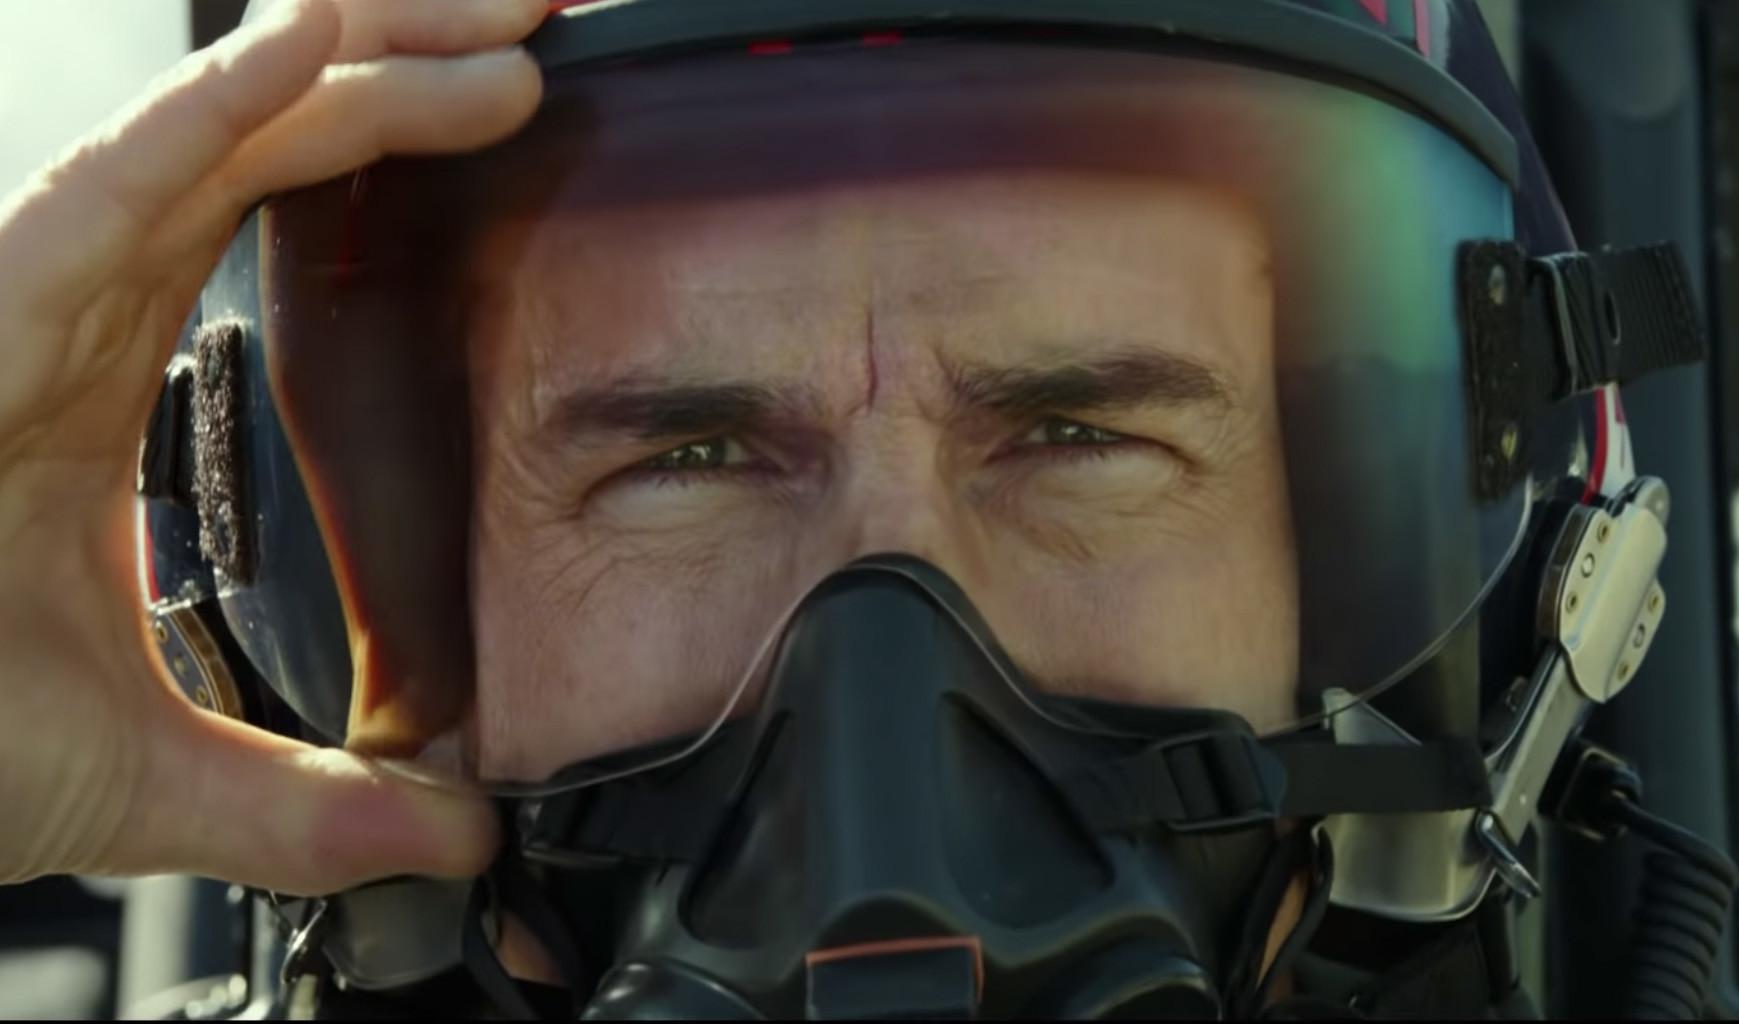 SEE IT: Tom Cruise takes flight in new 'Top Gun: Maverick' trailer